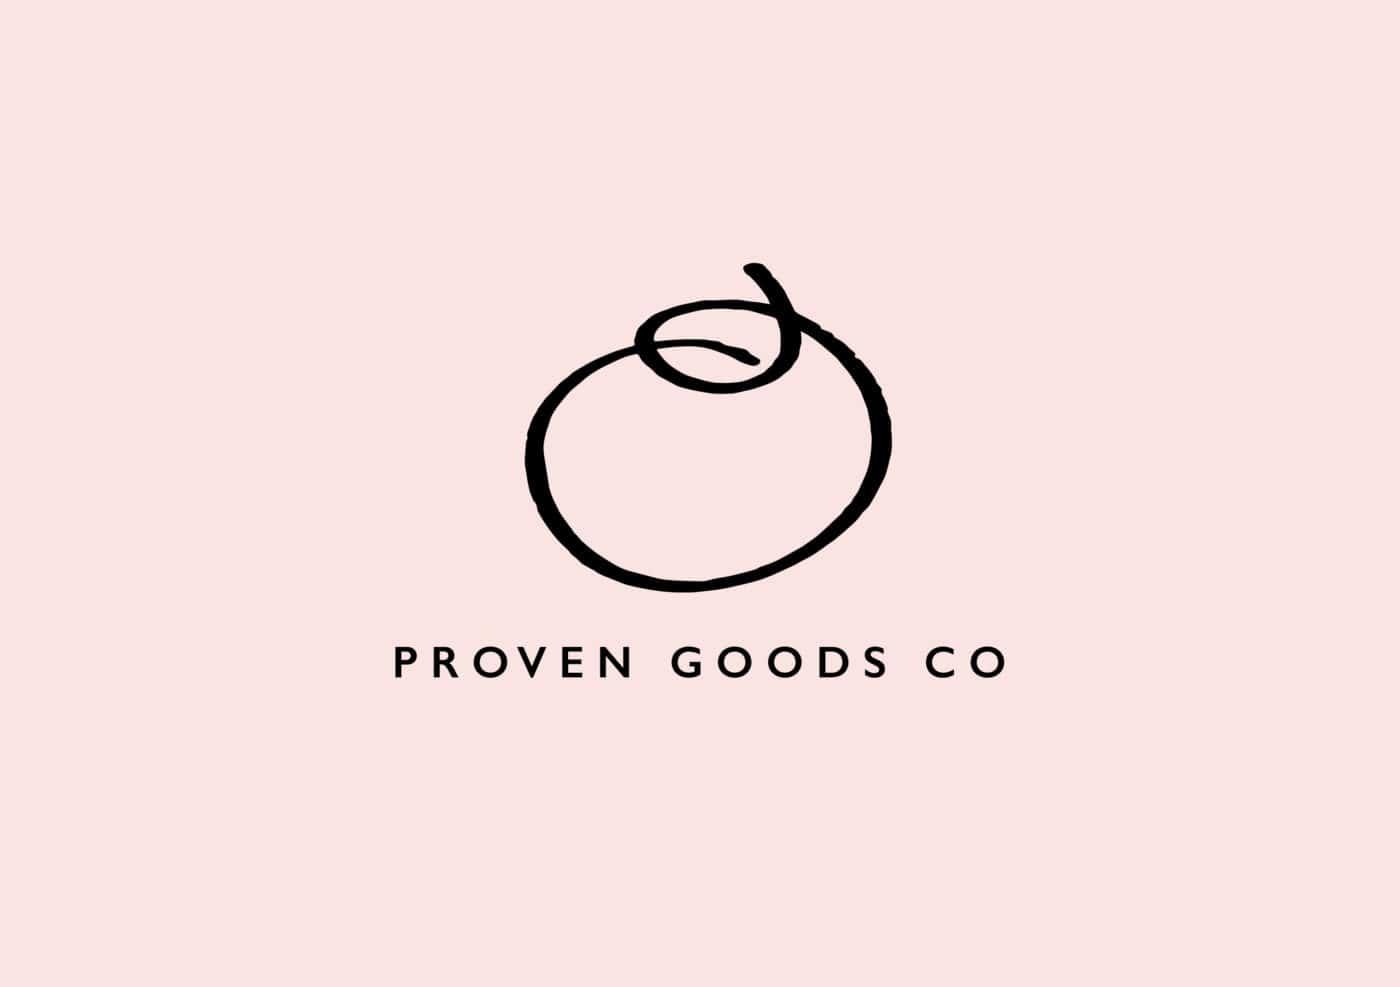 Proven Goods logo